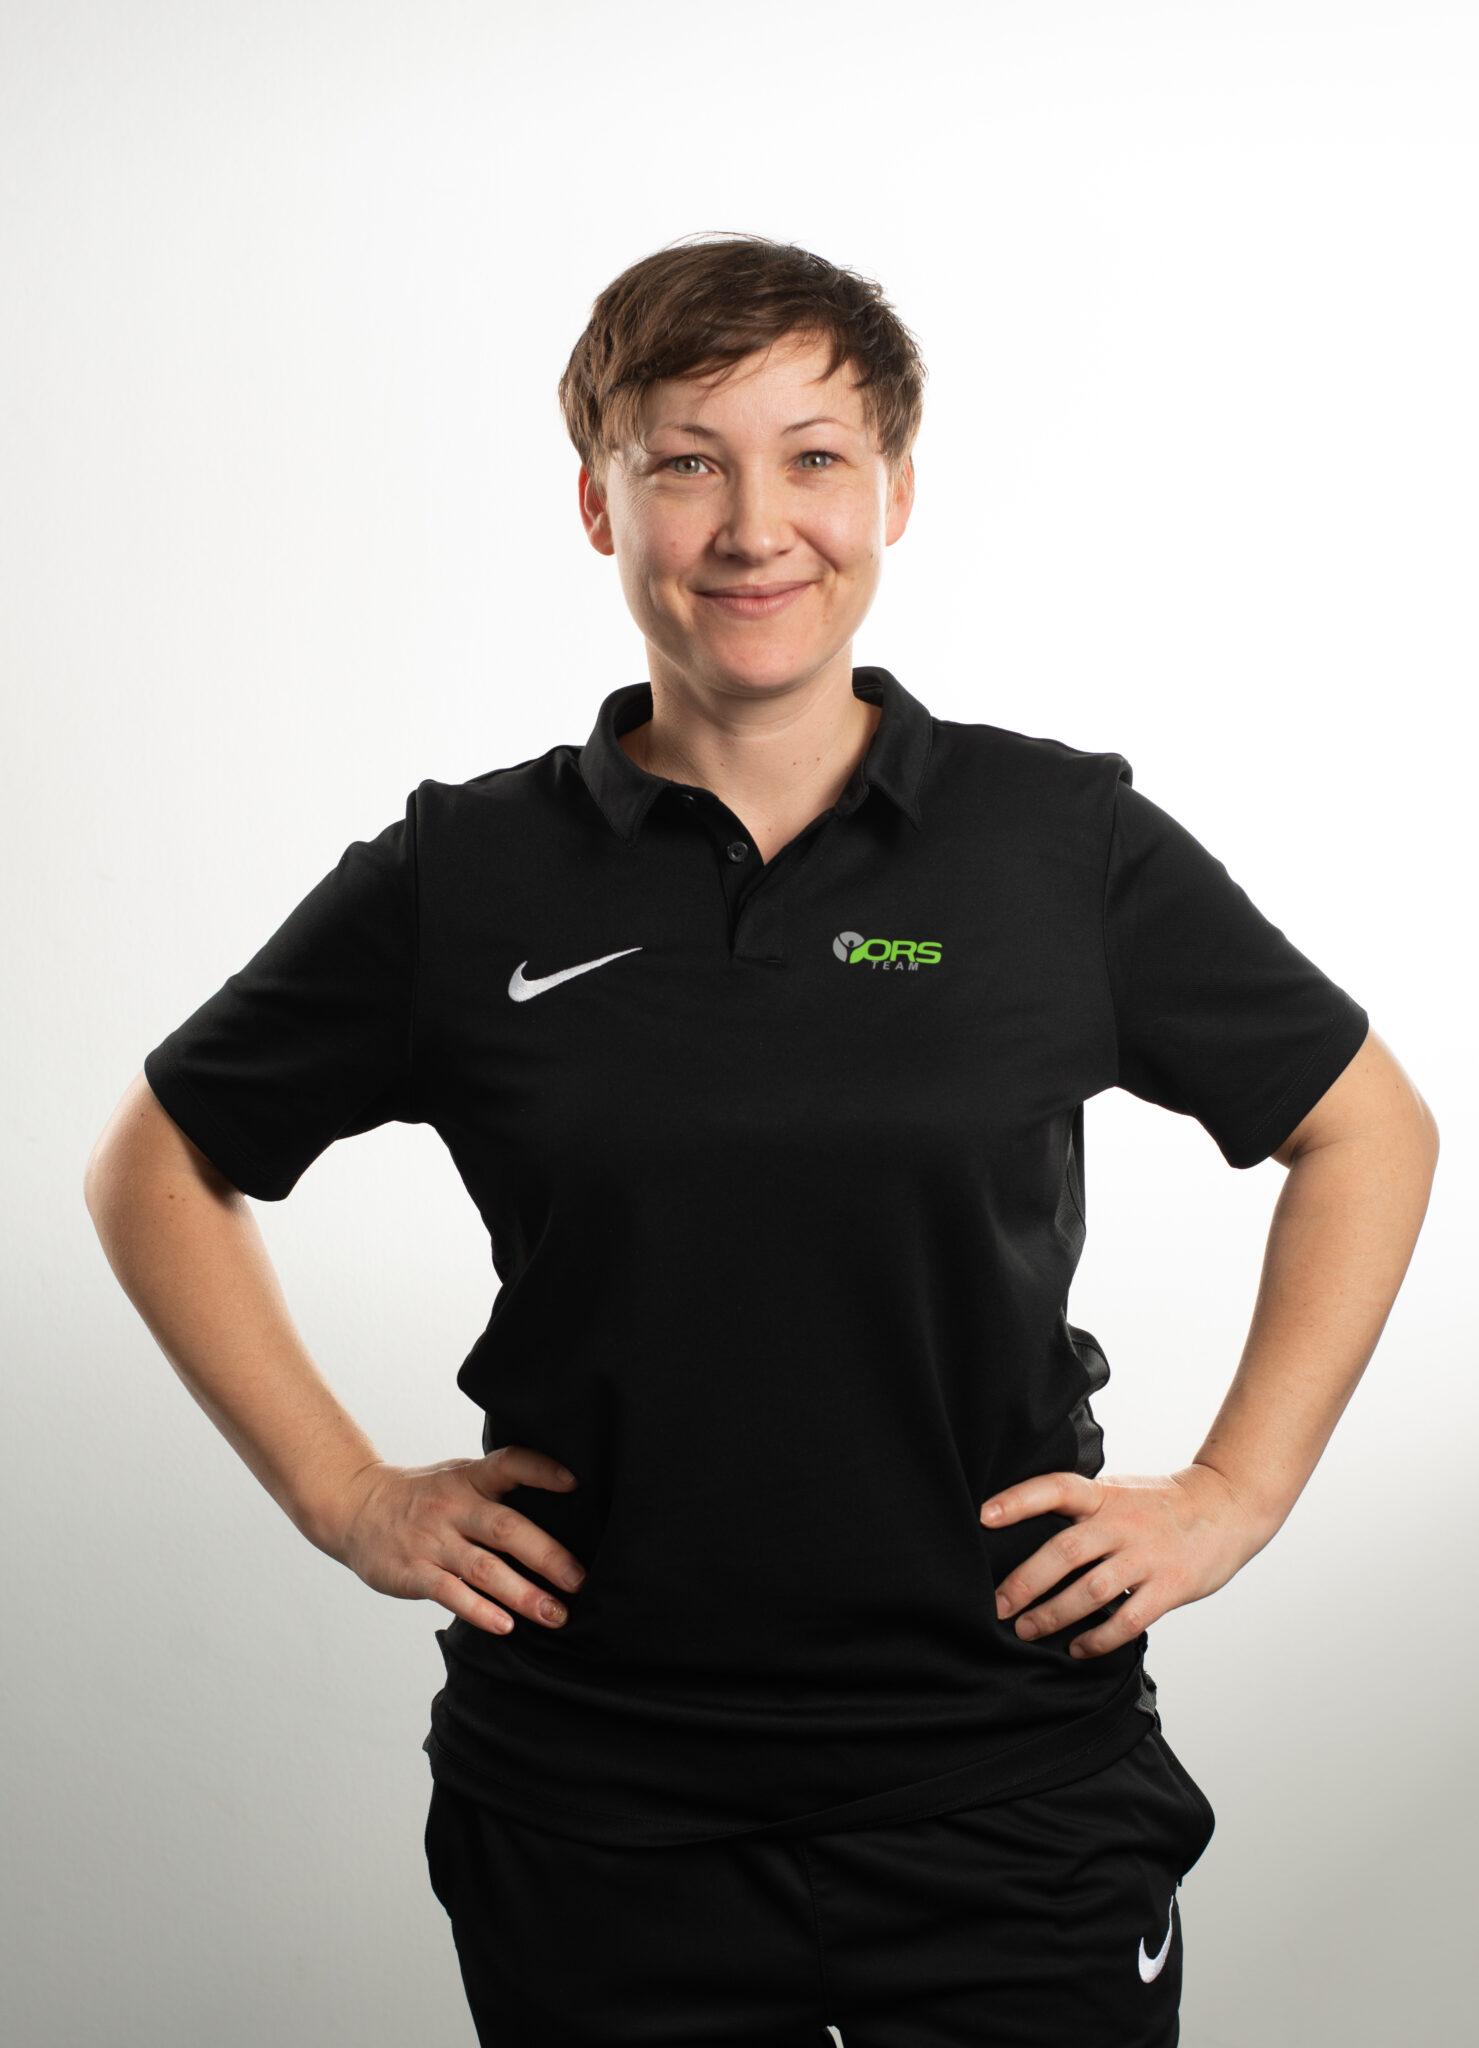 Kirsten Mahnke